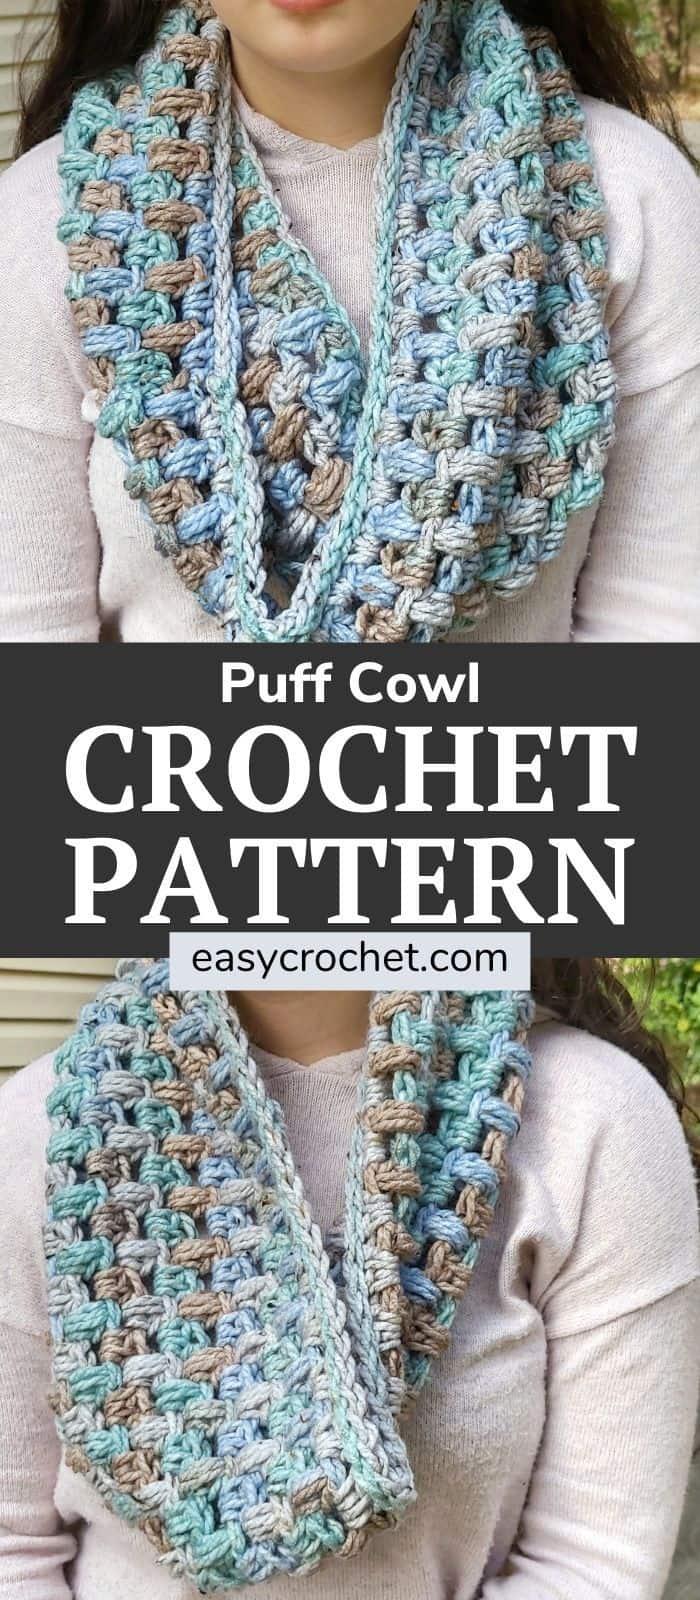 Williams Puff Cowl Crochet Pattern via @easycrochetcom